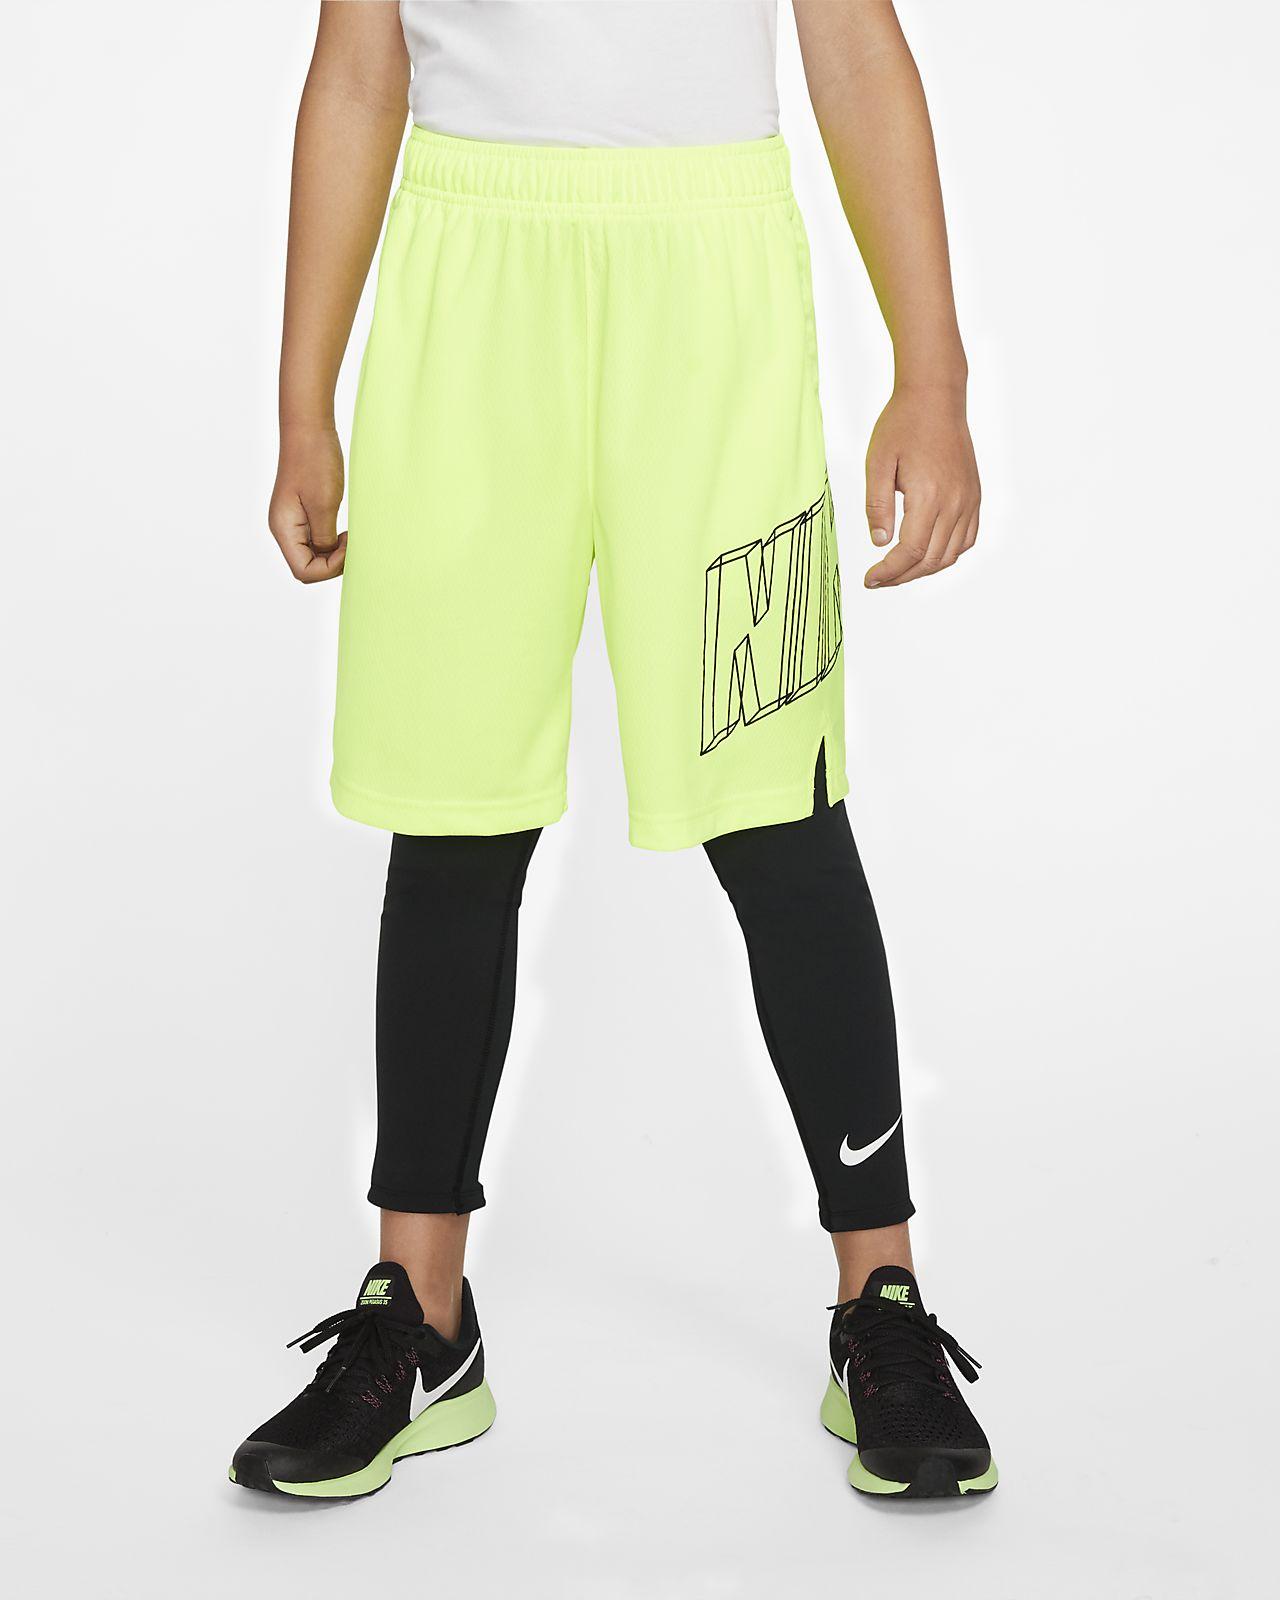 Nike Pro Trainingstights für ältere Kinder (Jungen)